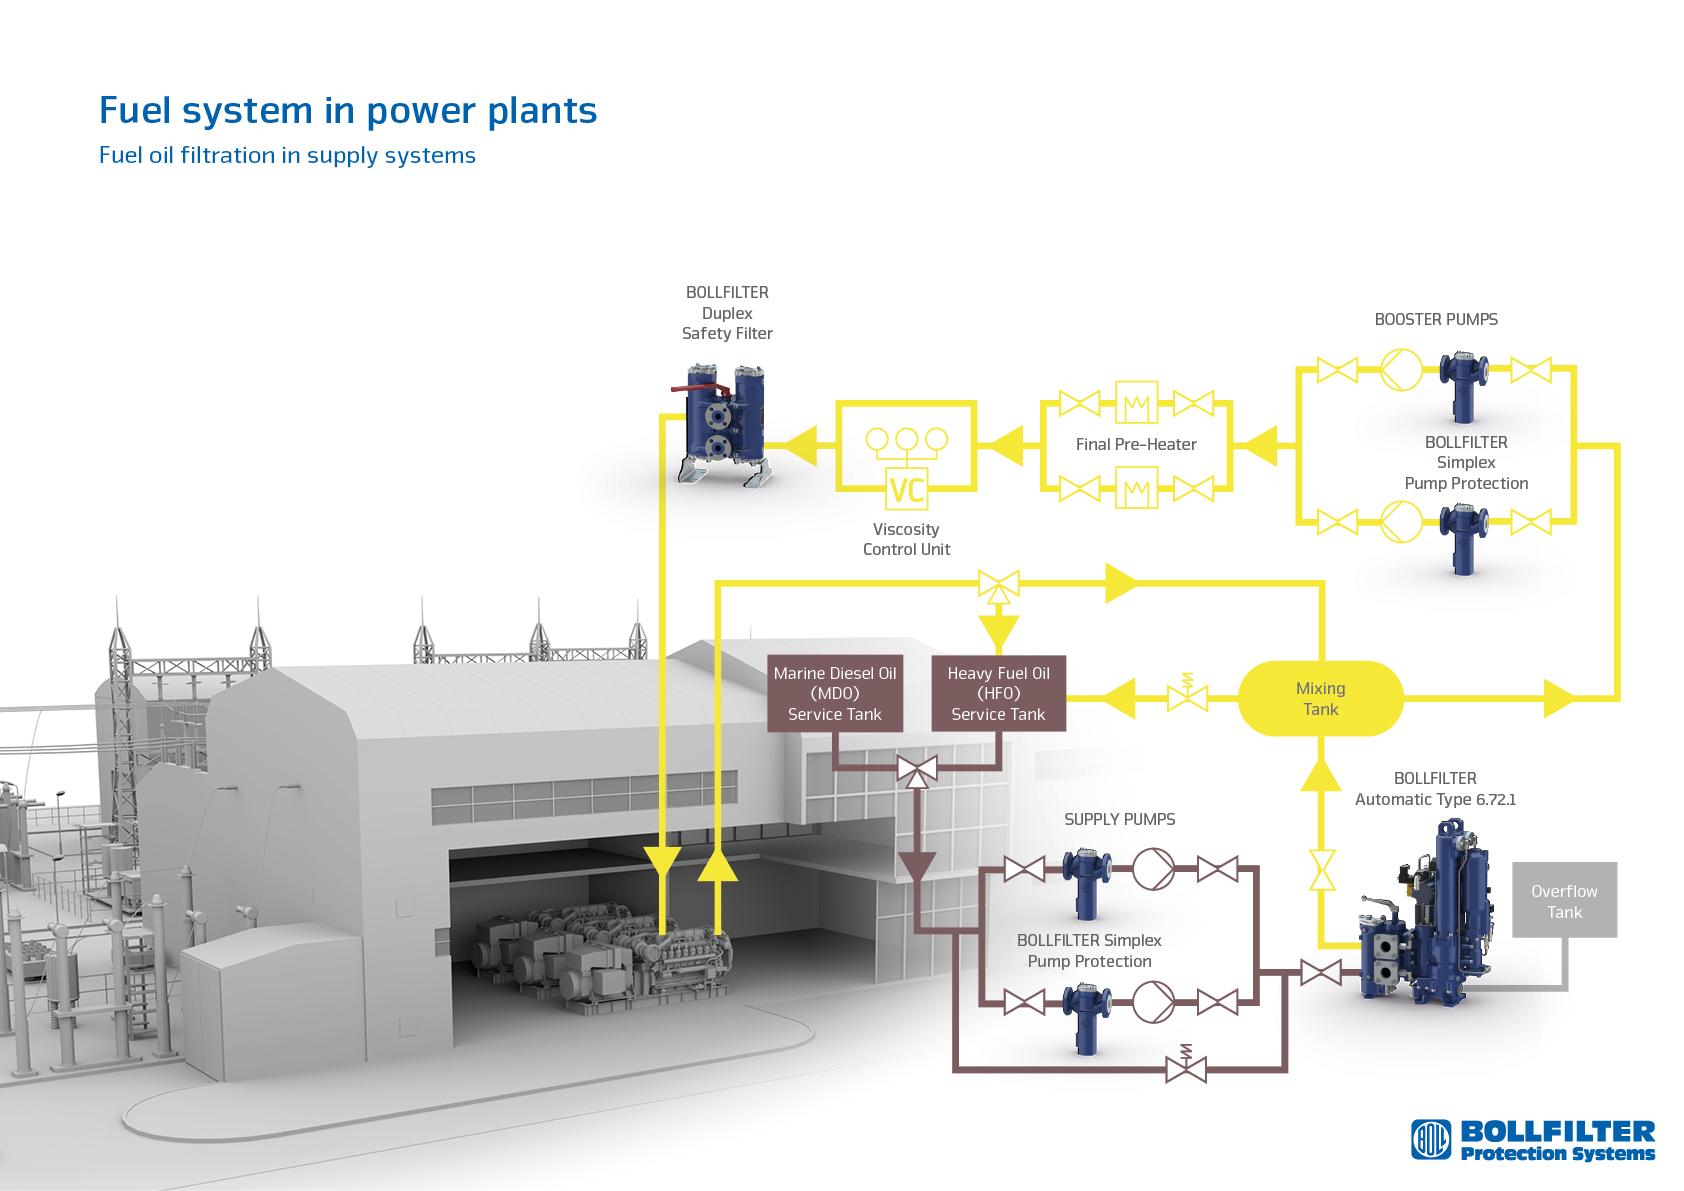 Coal Power Plant Diagram Oil Power Plant Diagram Wiring Diagram